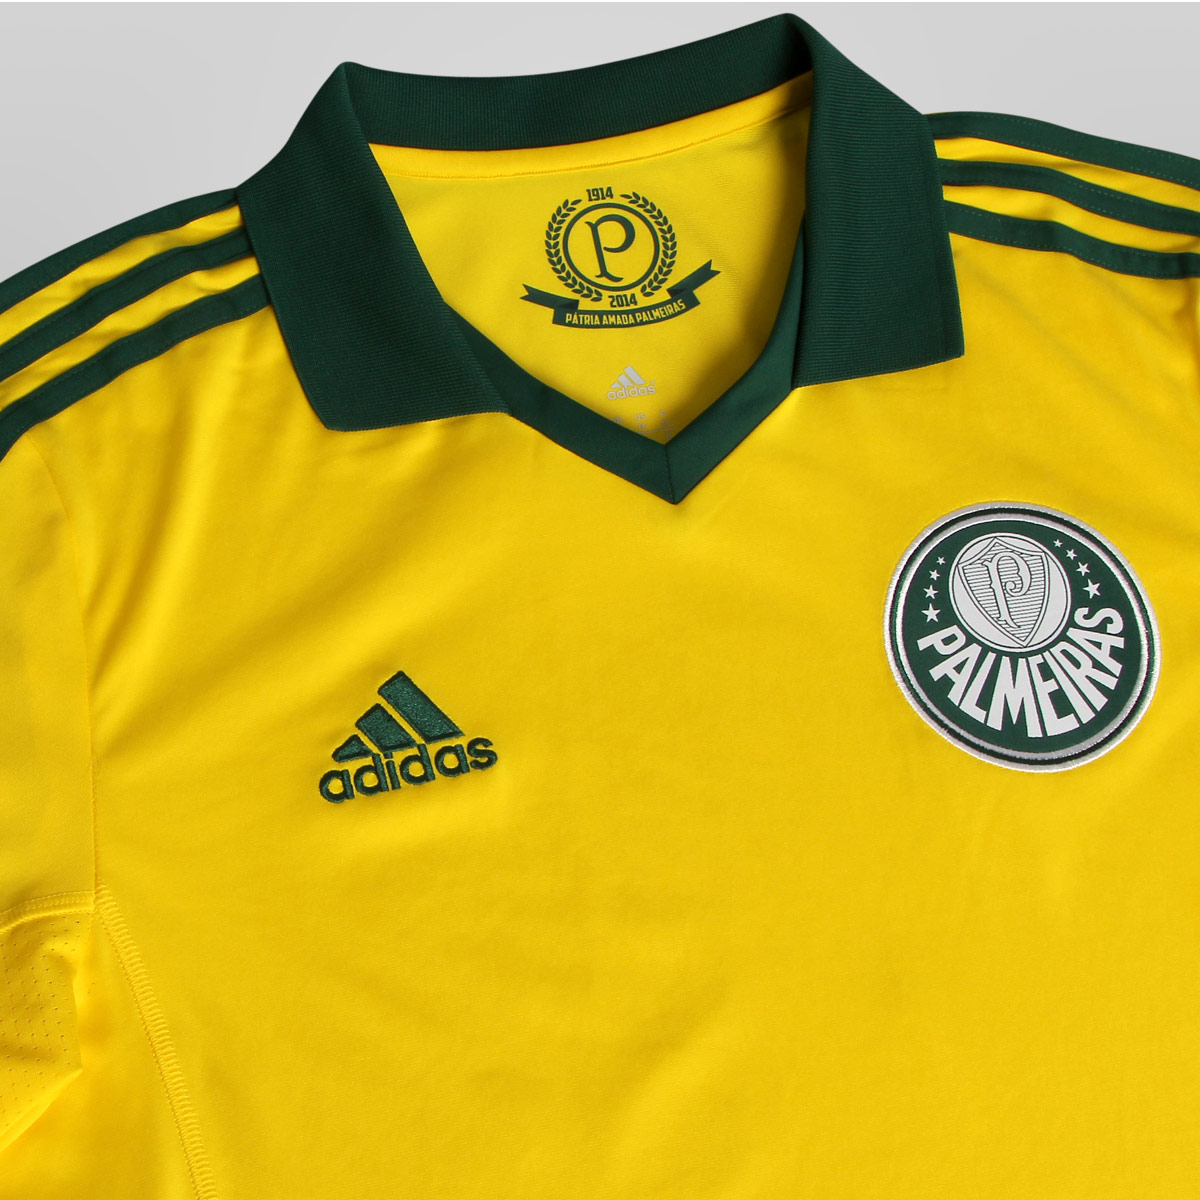 Palmeiras 13 14 Third Kit detail